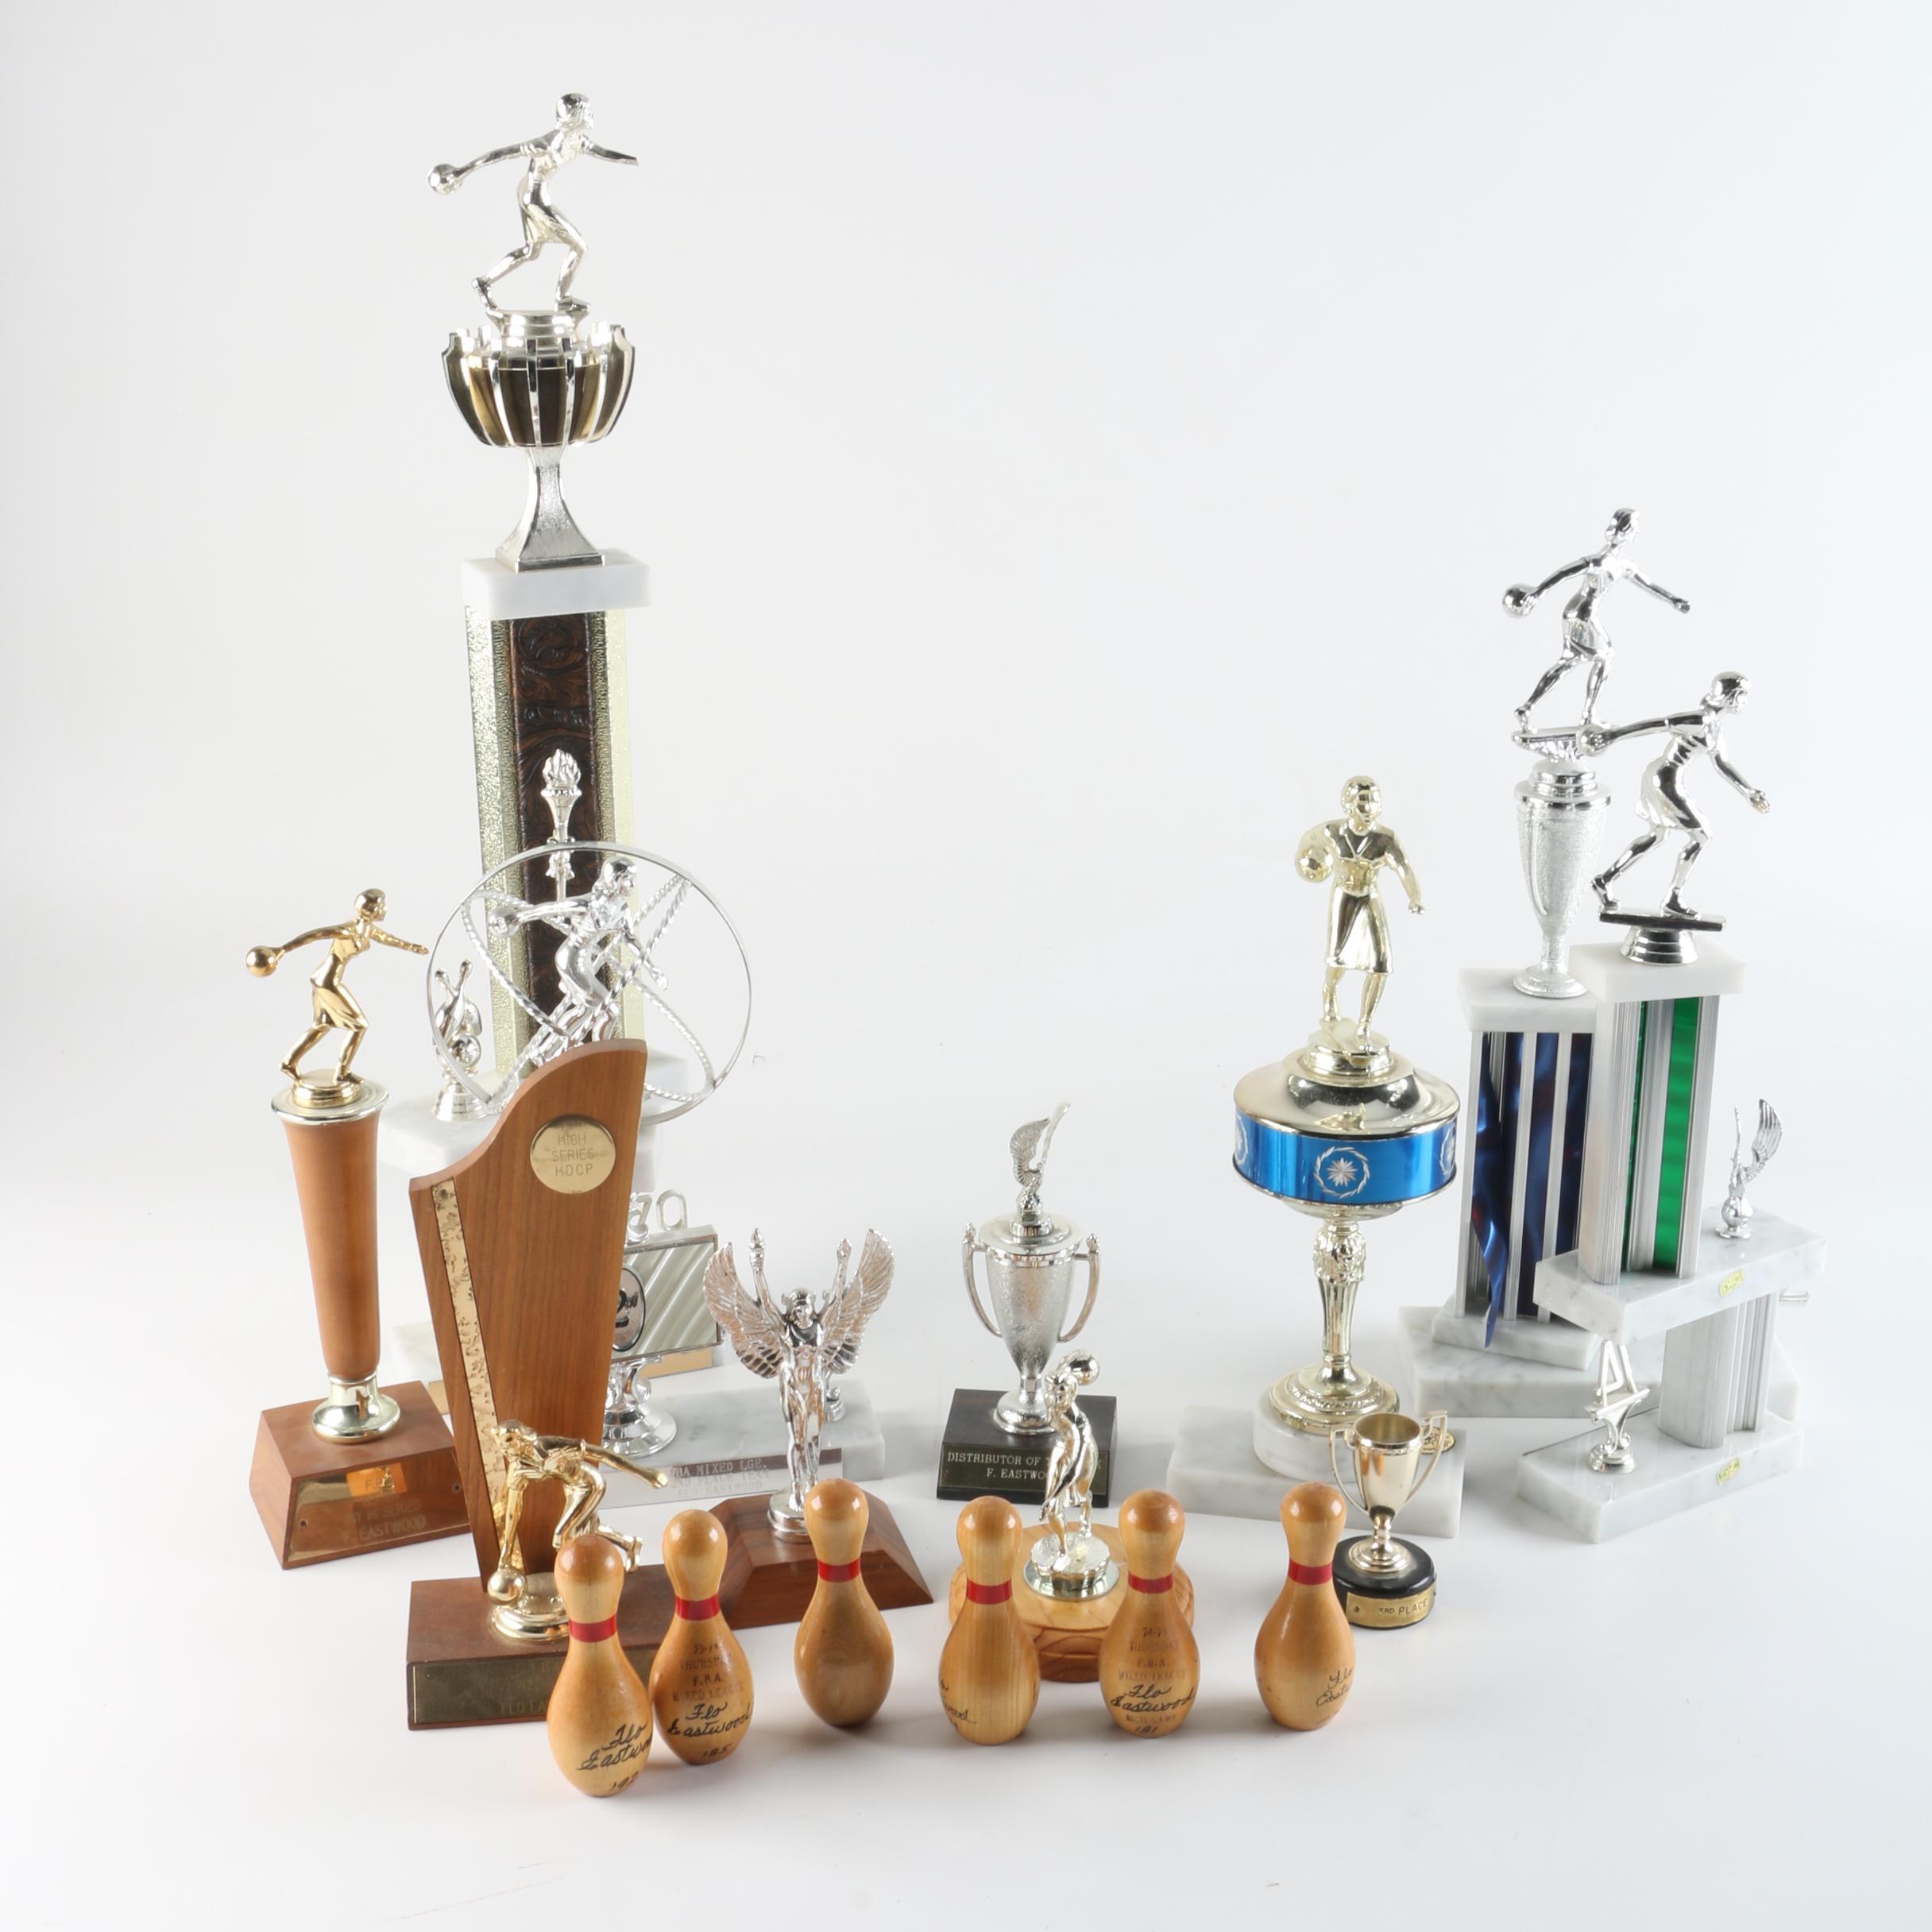 C. 1970s Bowling Trophies